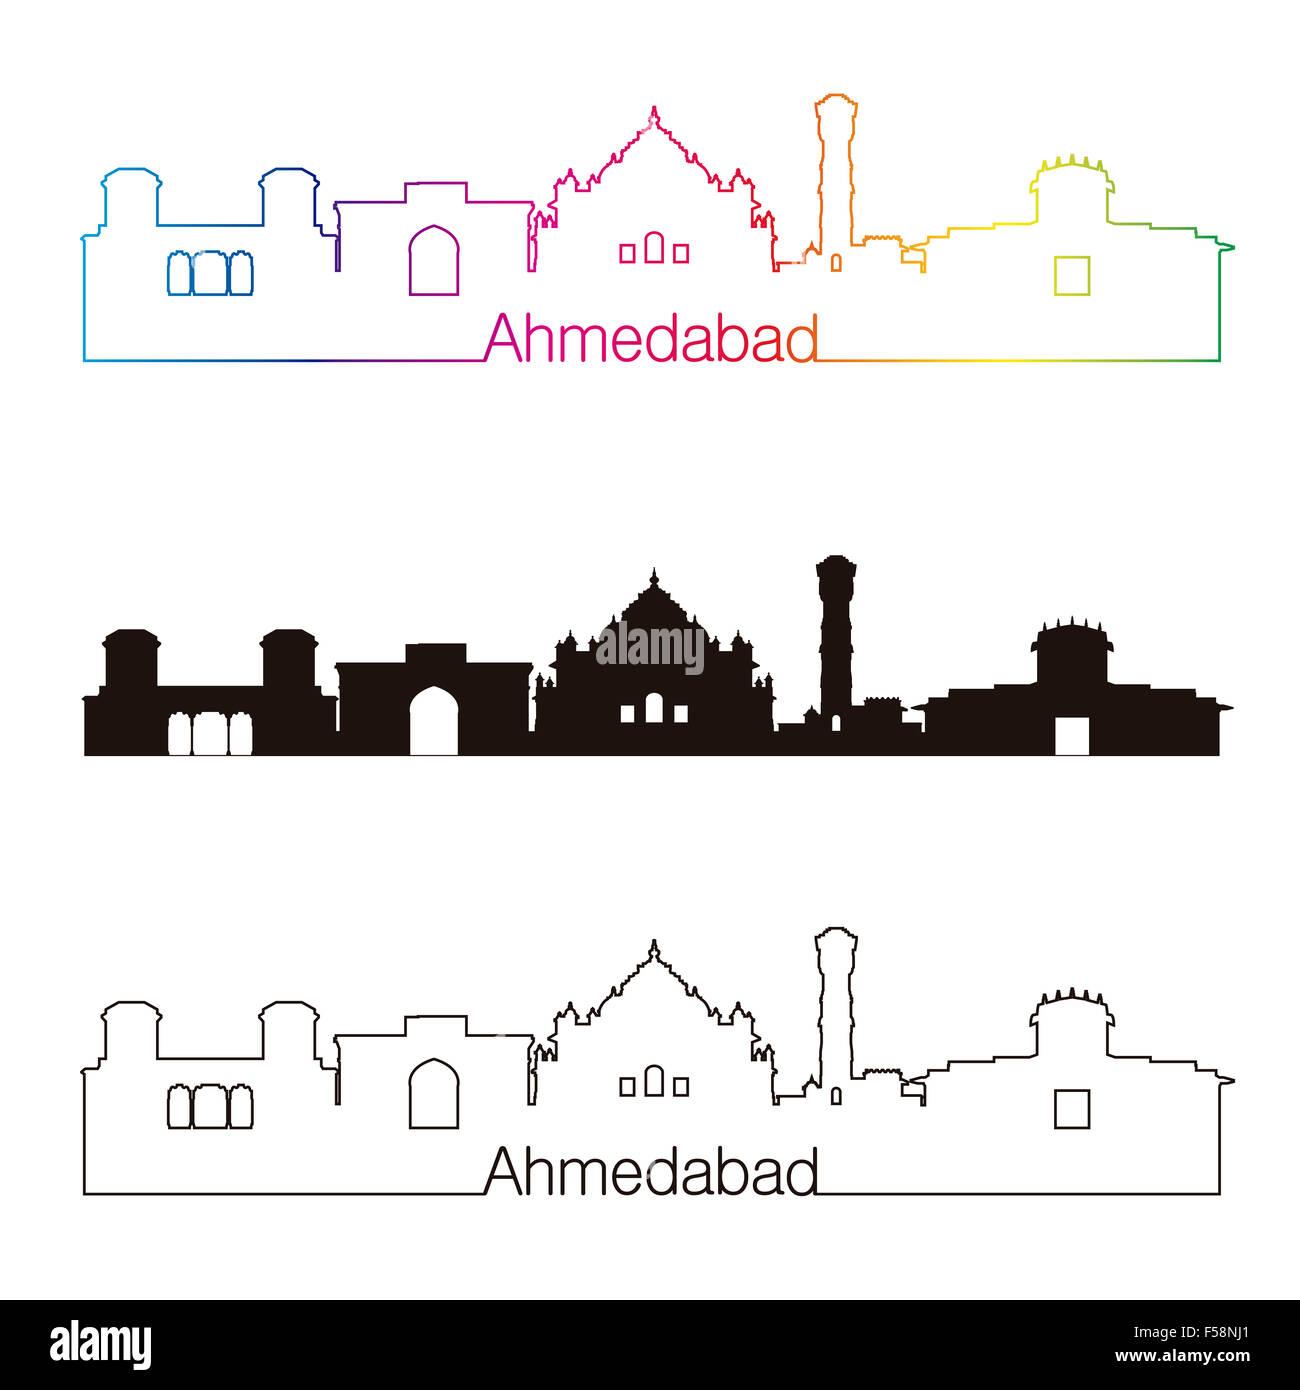 Ahmedabad skyline linear style with rainbow in editable vector file - Stock Image